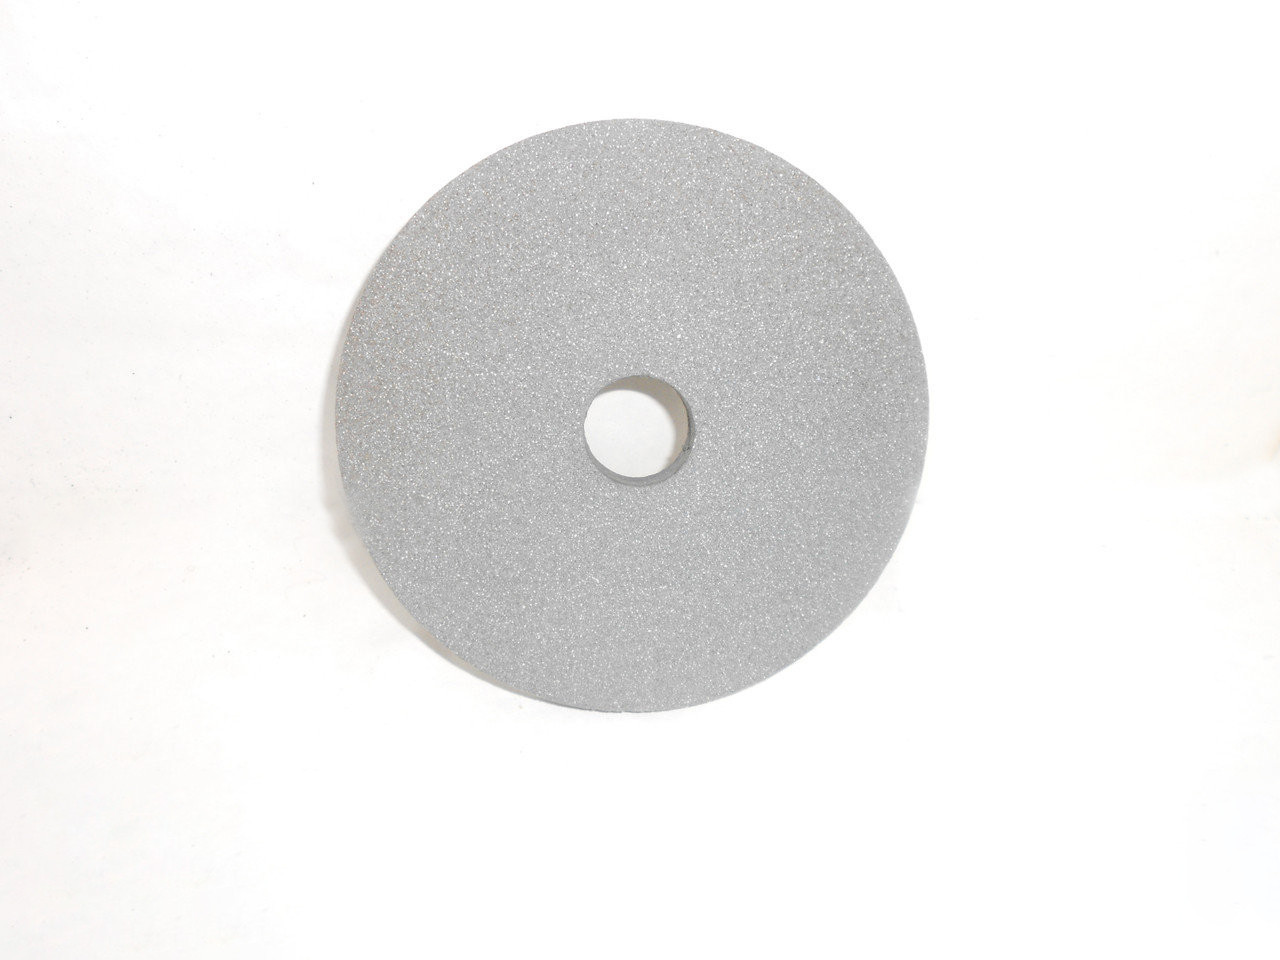 Круг шлифовальный 14А ПП 50х32х16  16-40 СМ